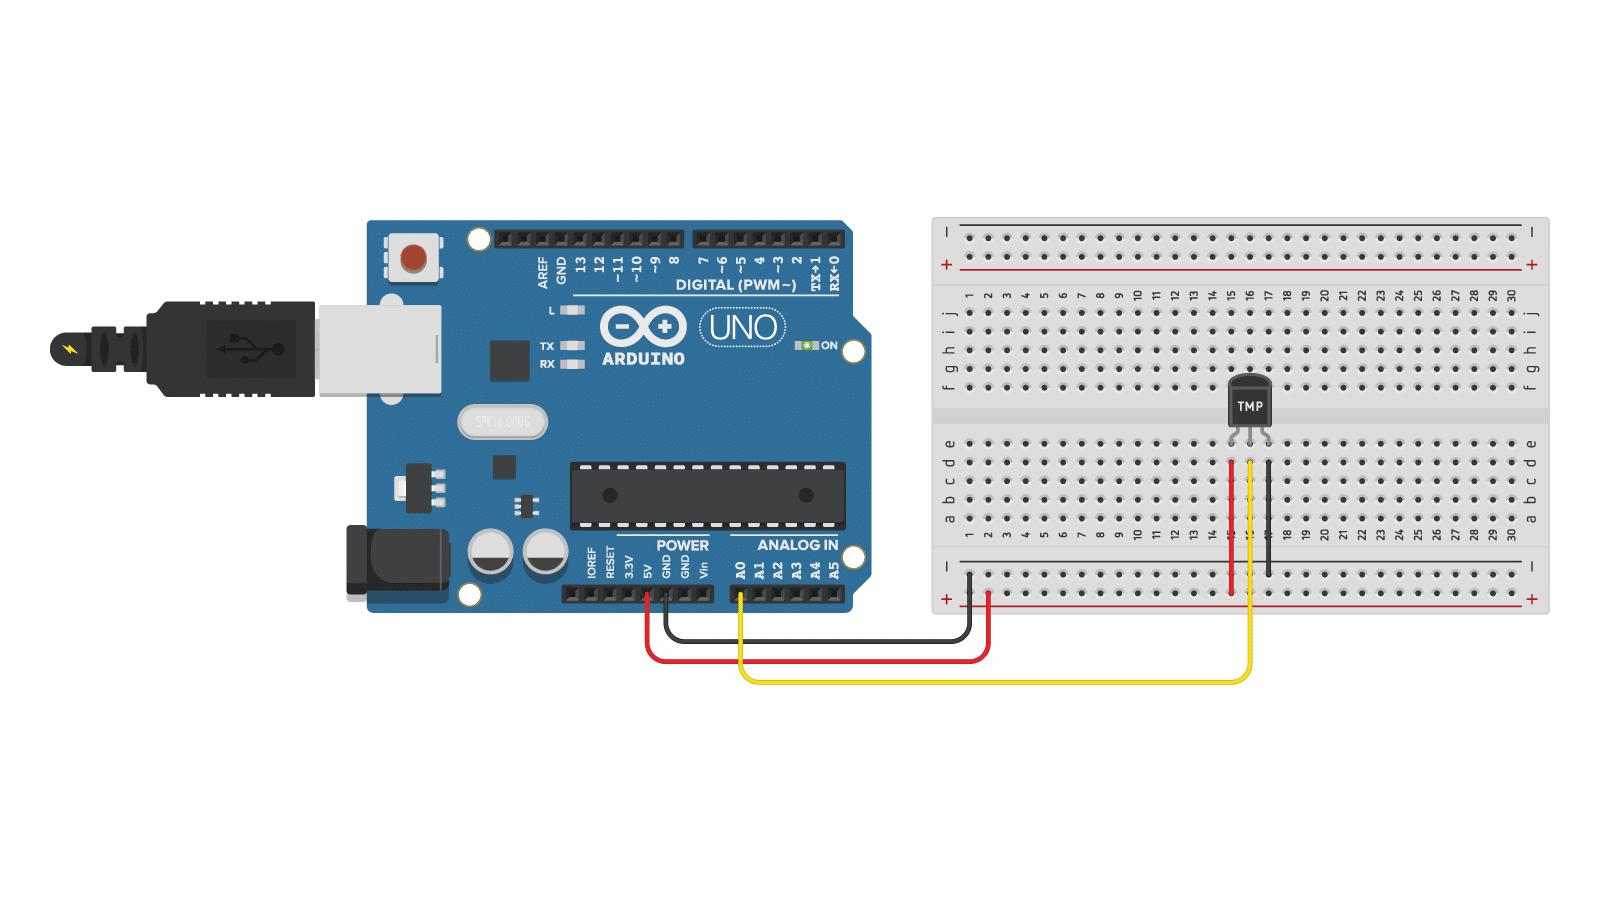 TMP36 analog temperature sensor with Arduino Uno wiring diagram